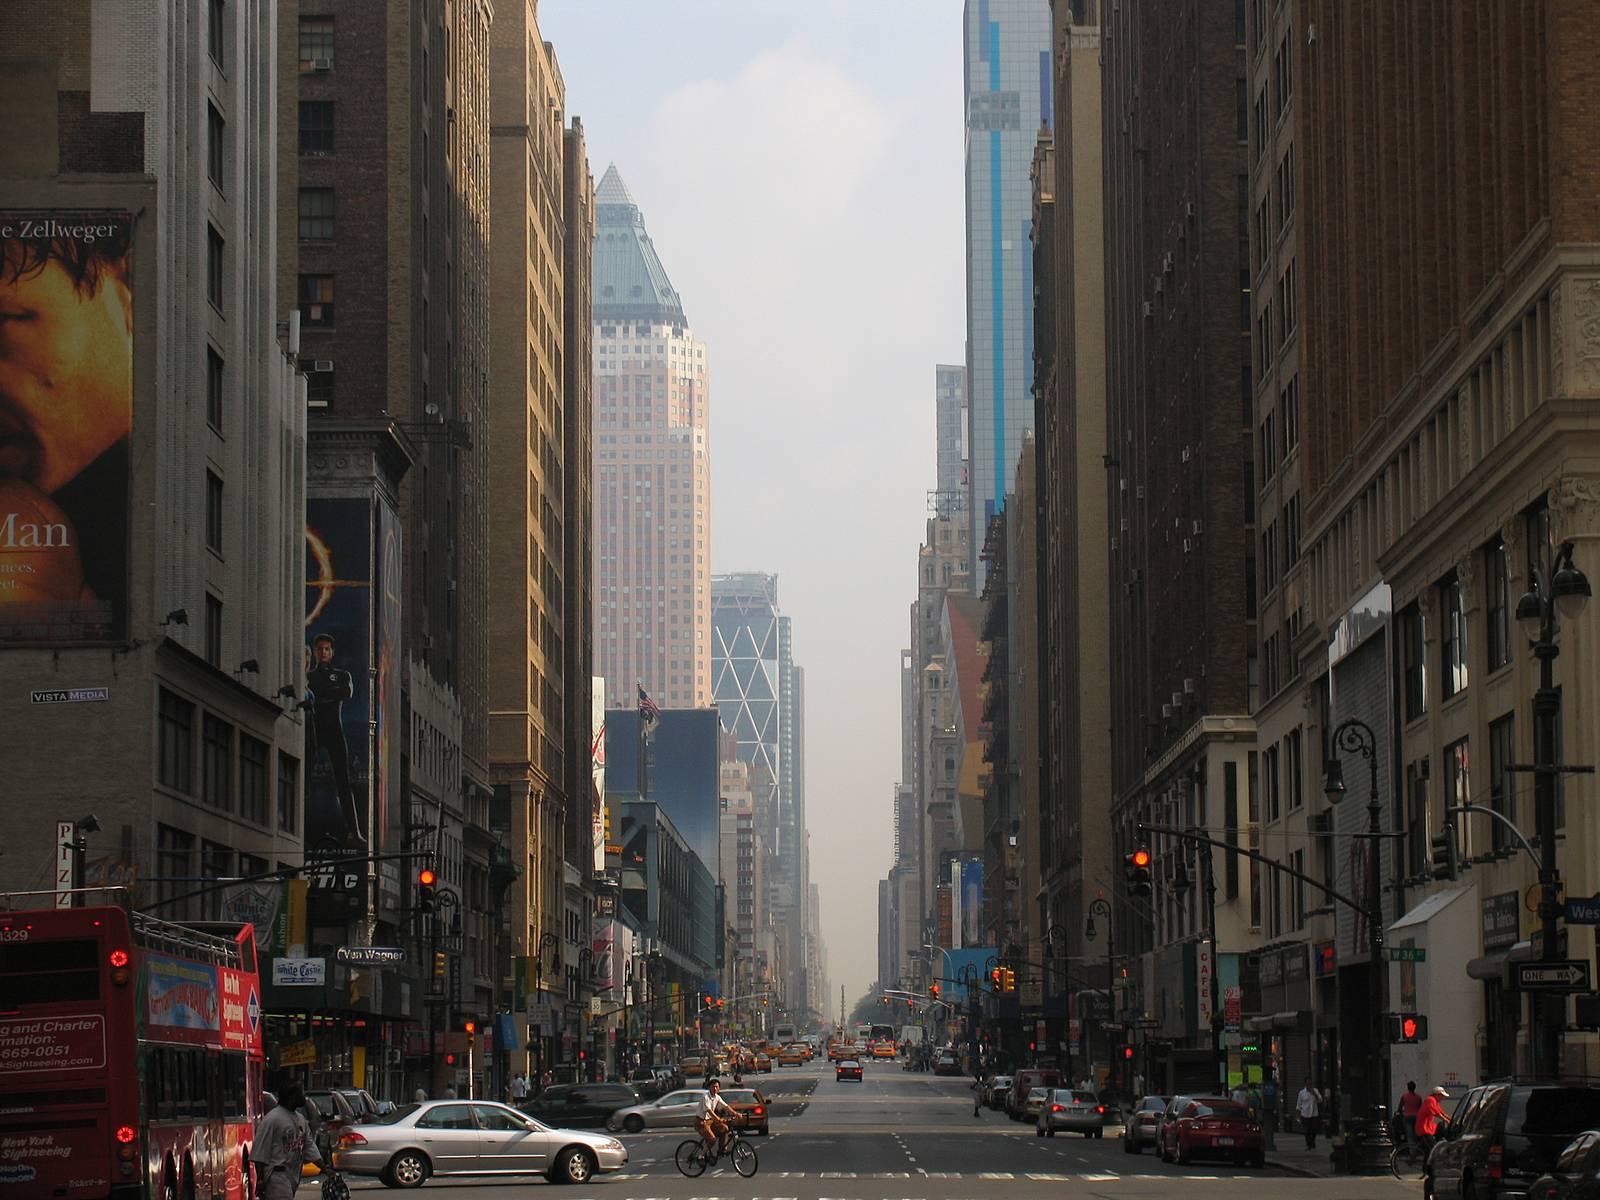 New-York-street-skyscrapers-Broadway